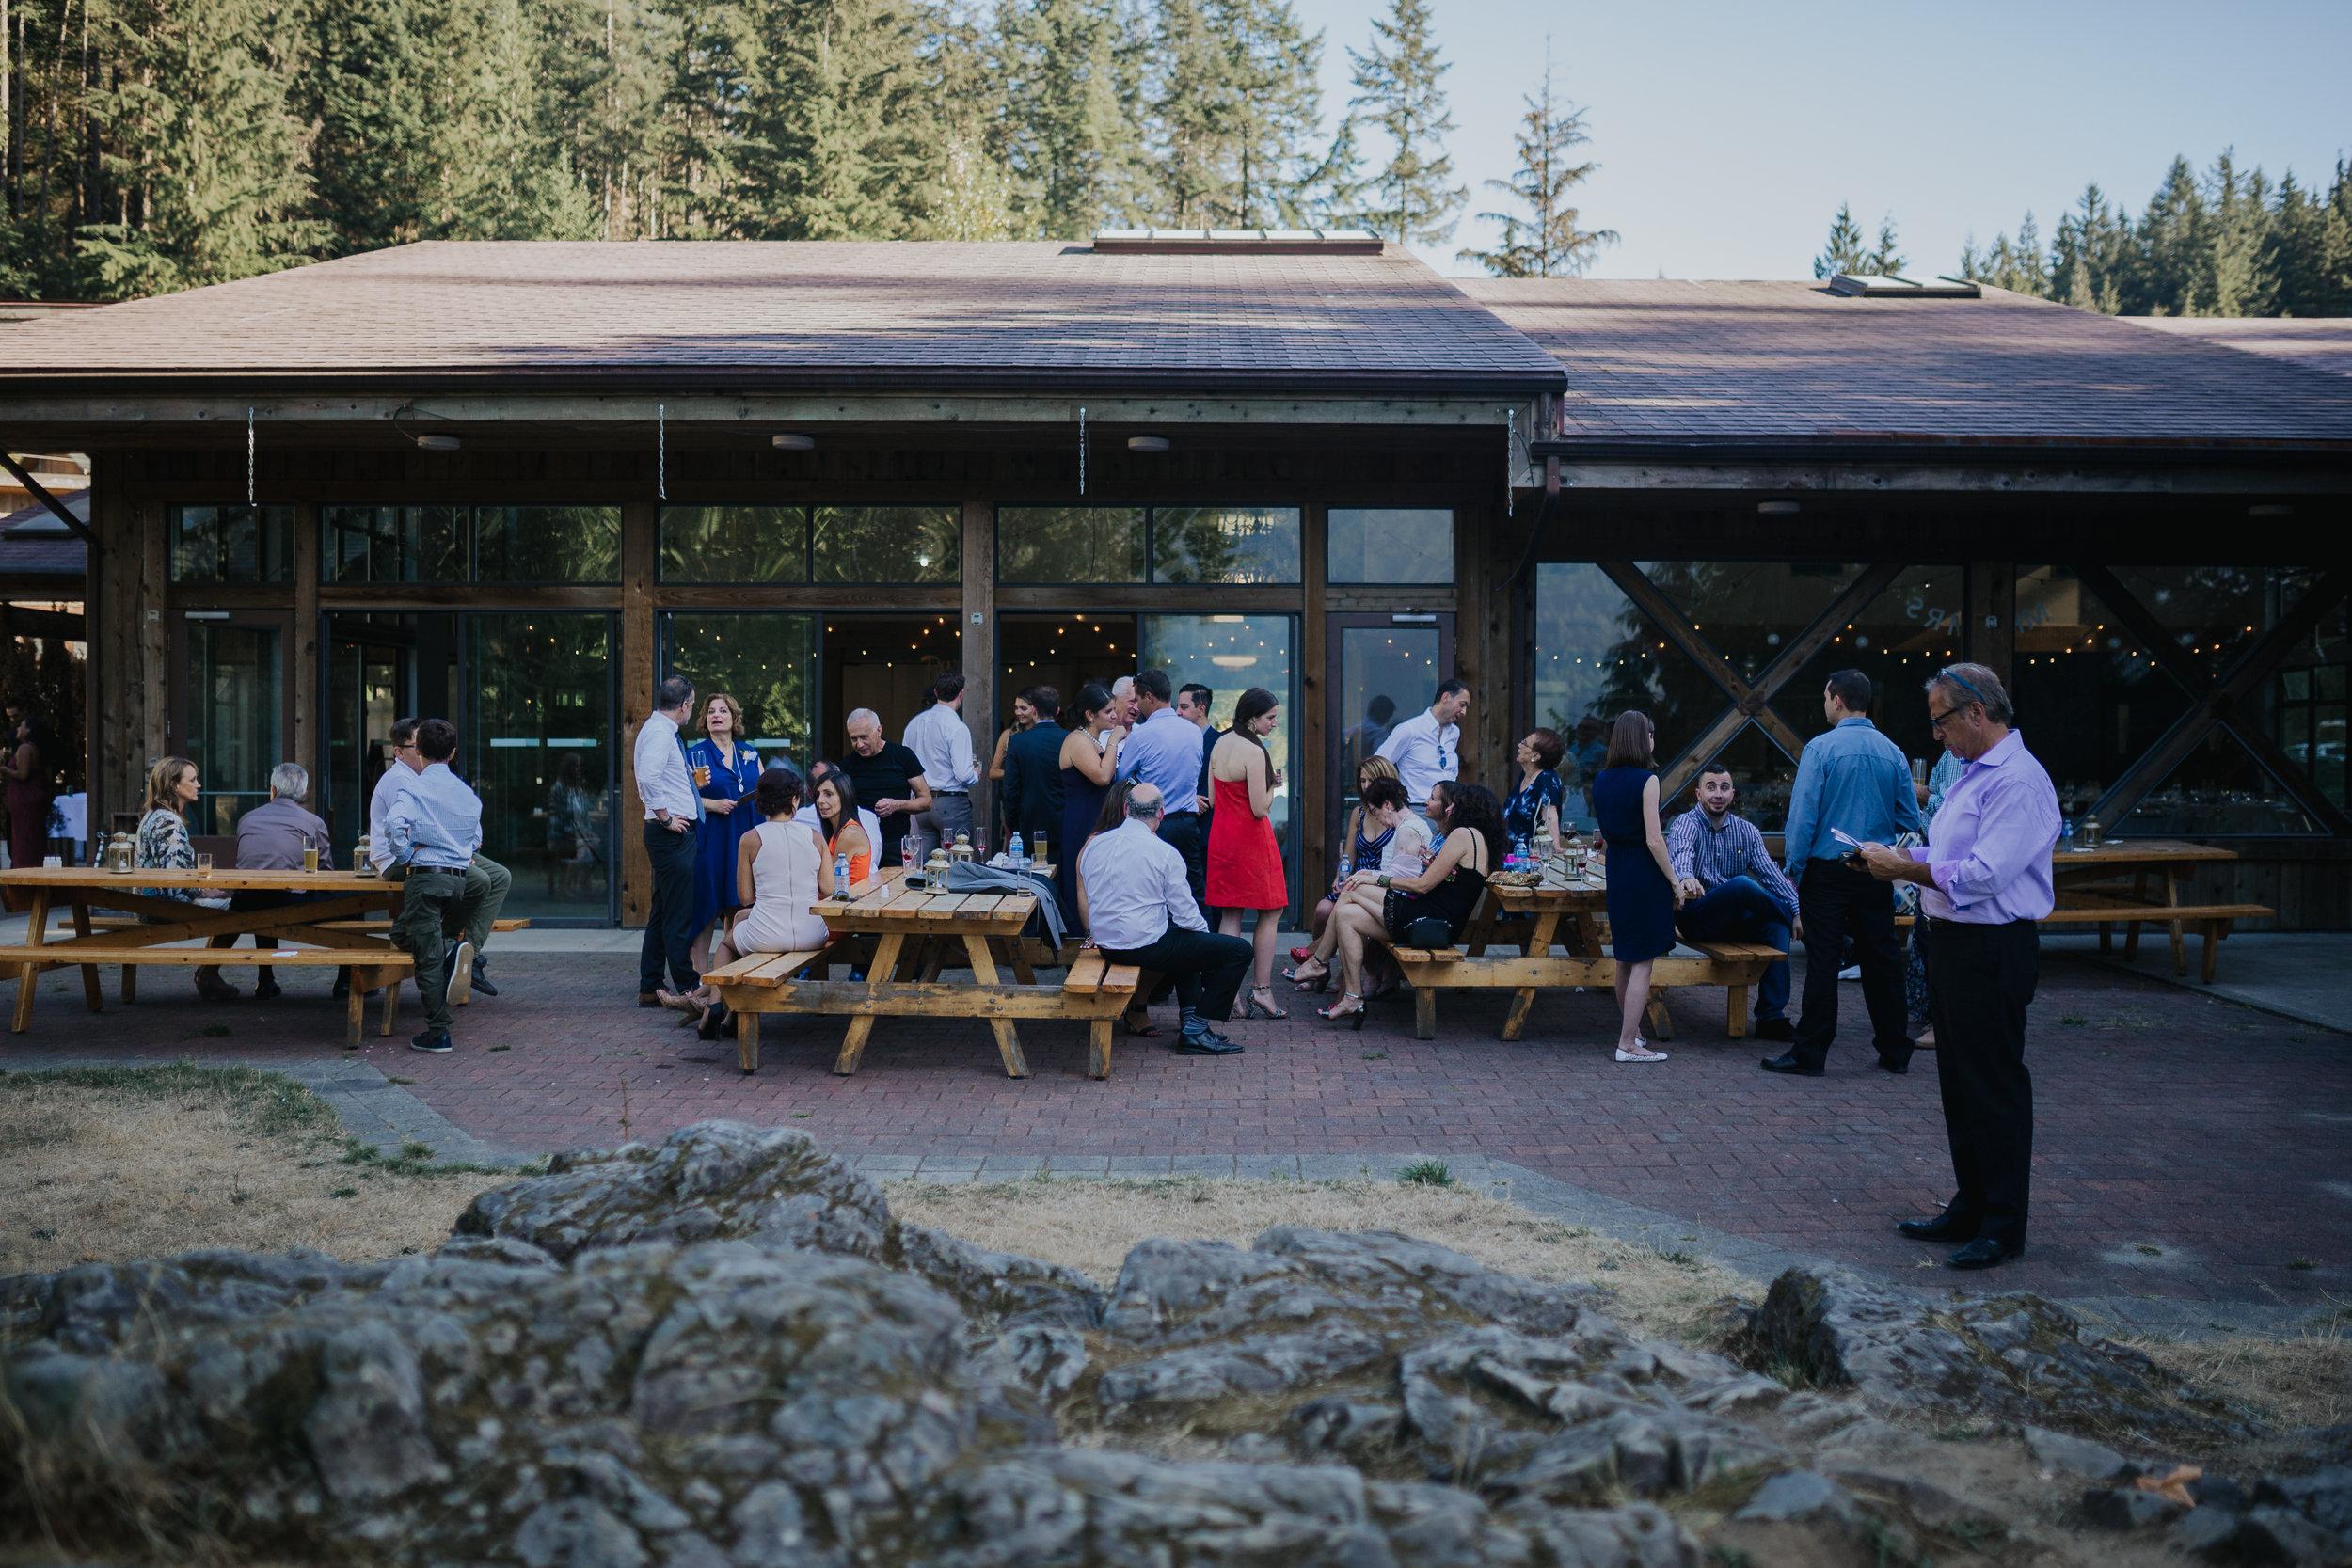 Camp Howdy Rustic Cabin Wedding reception